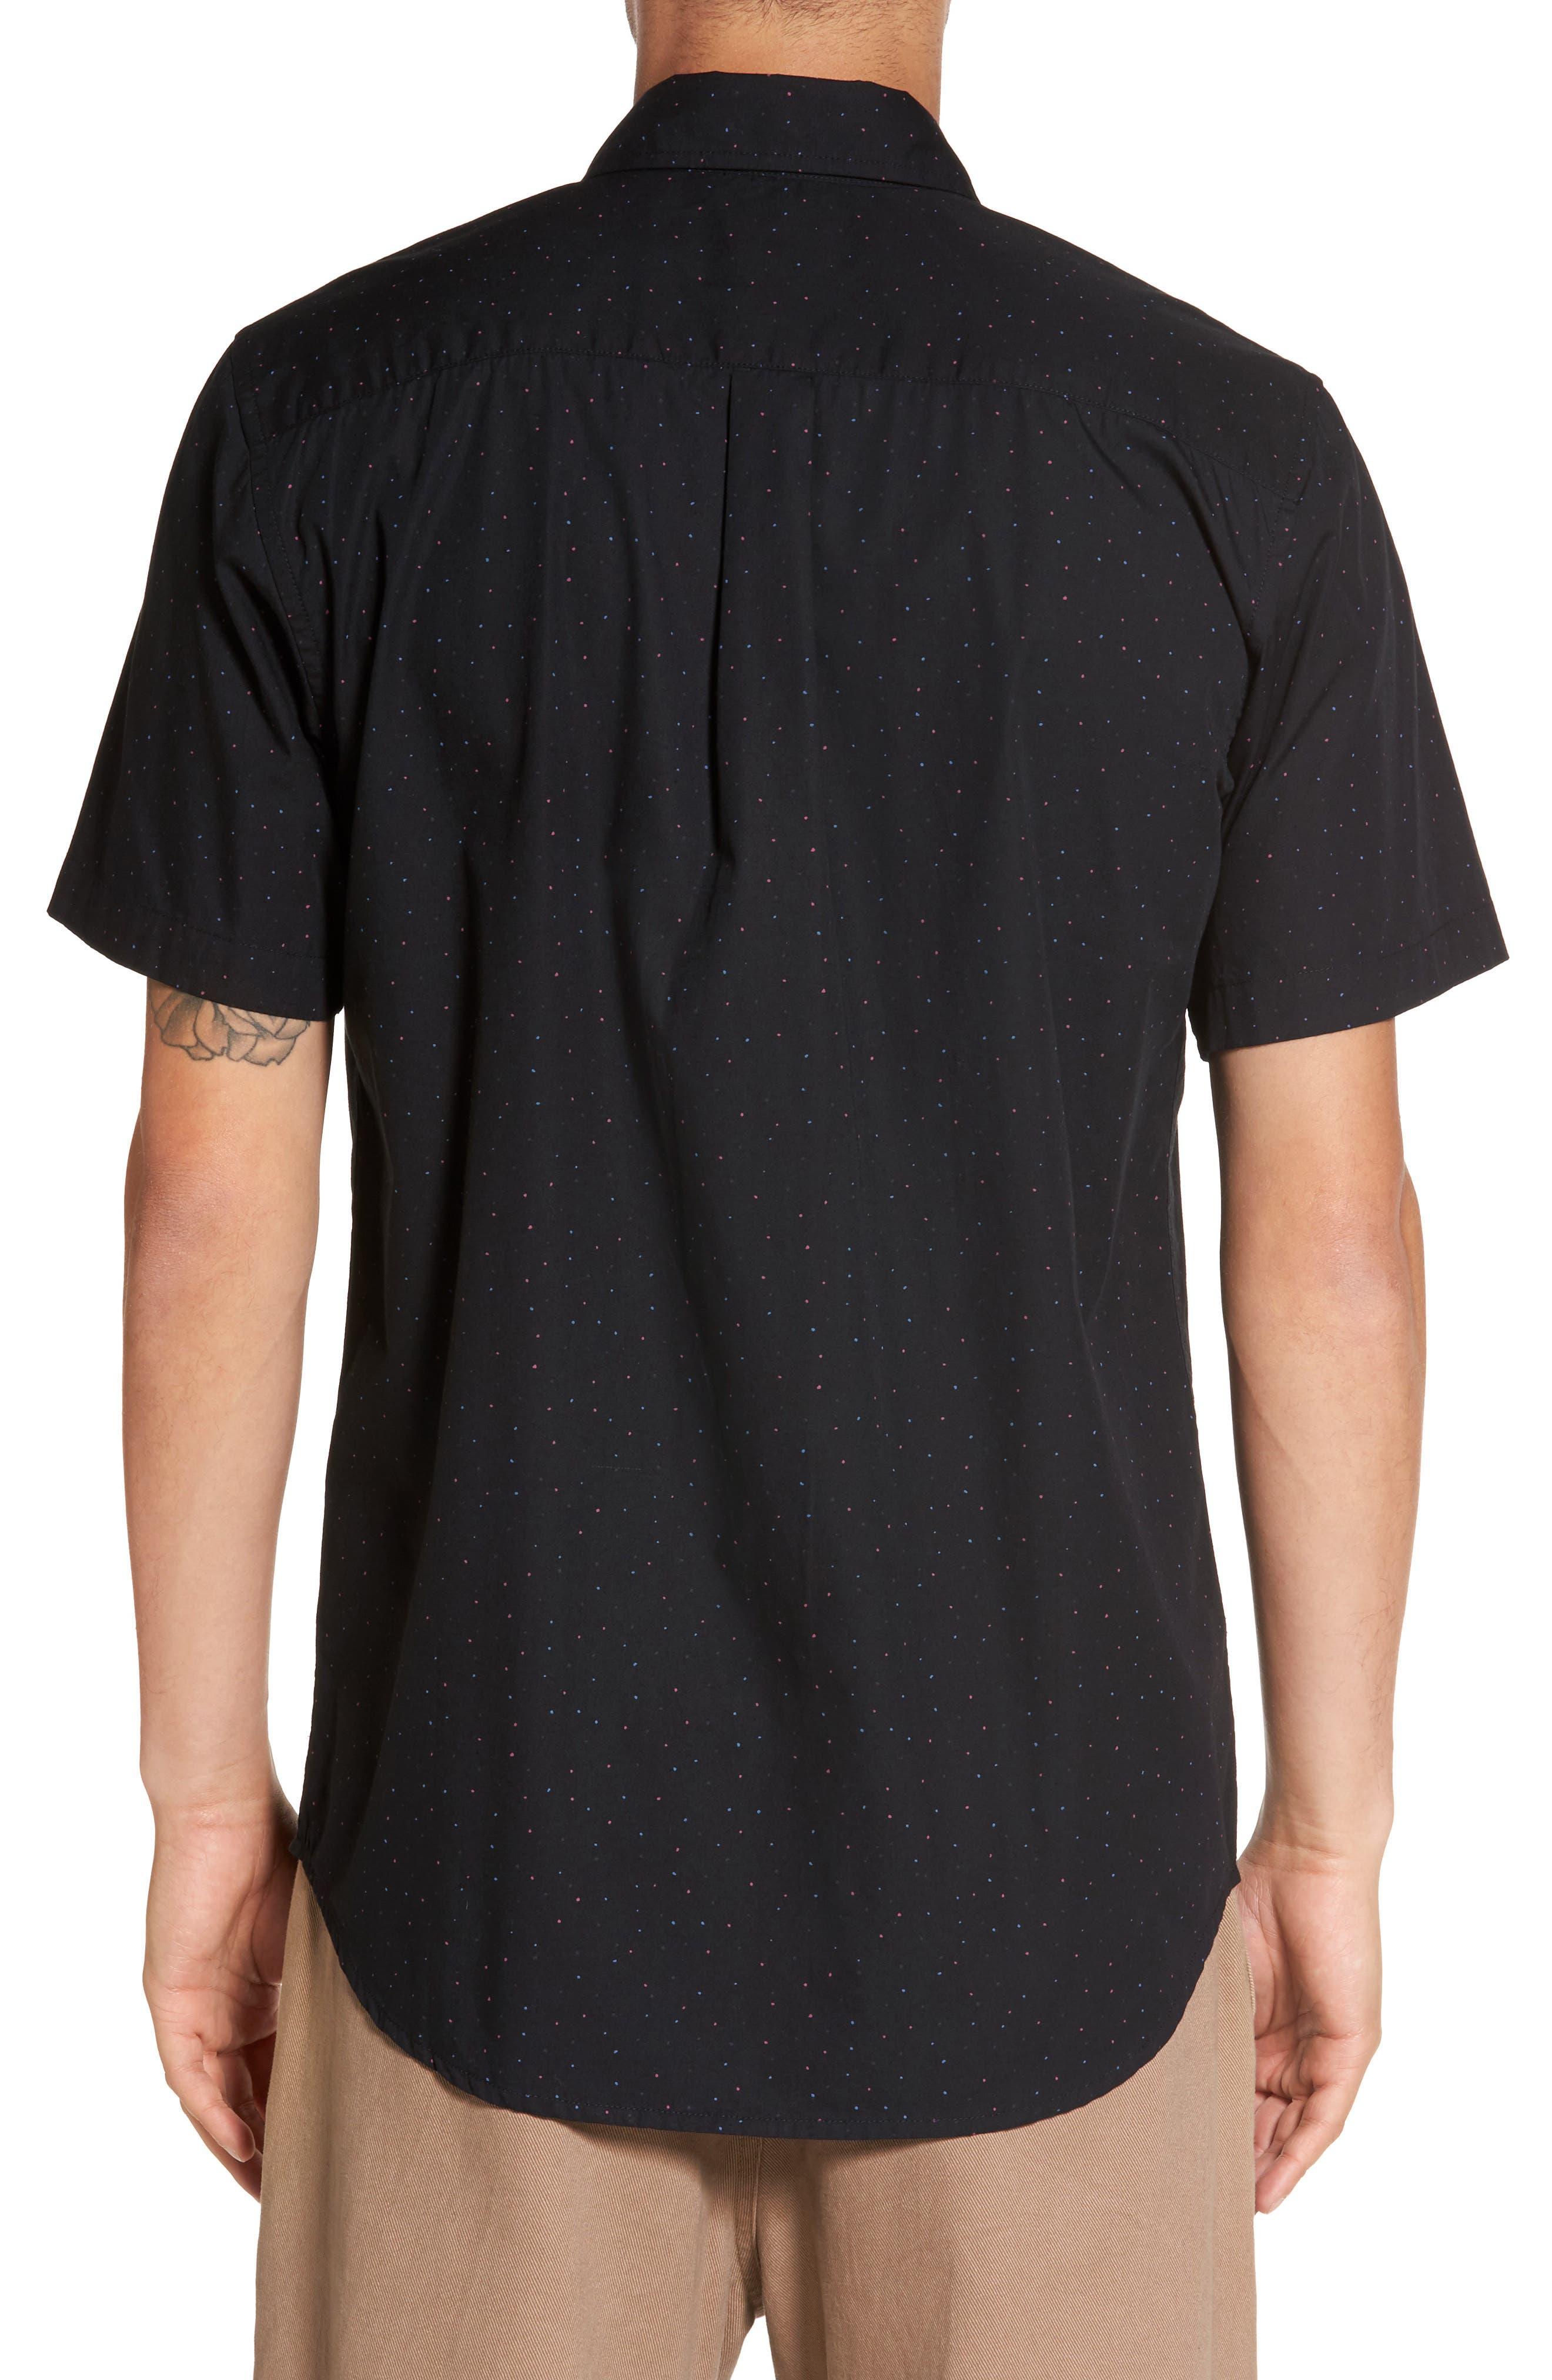 Alternate Image 2  - Obey Voyage Flecked Woven Shirt